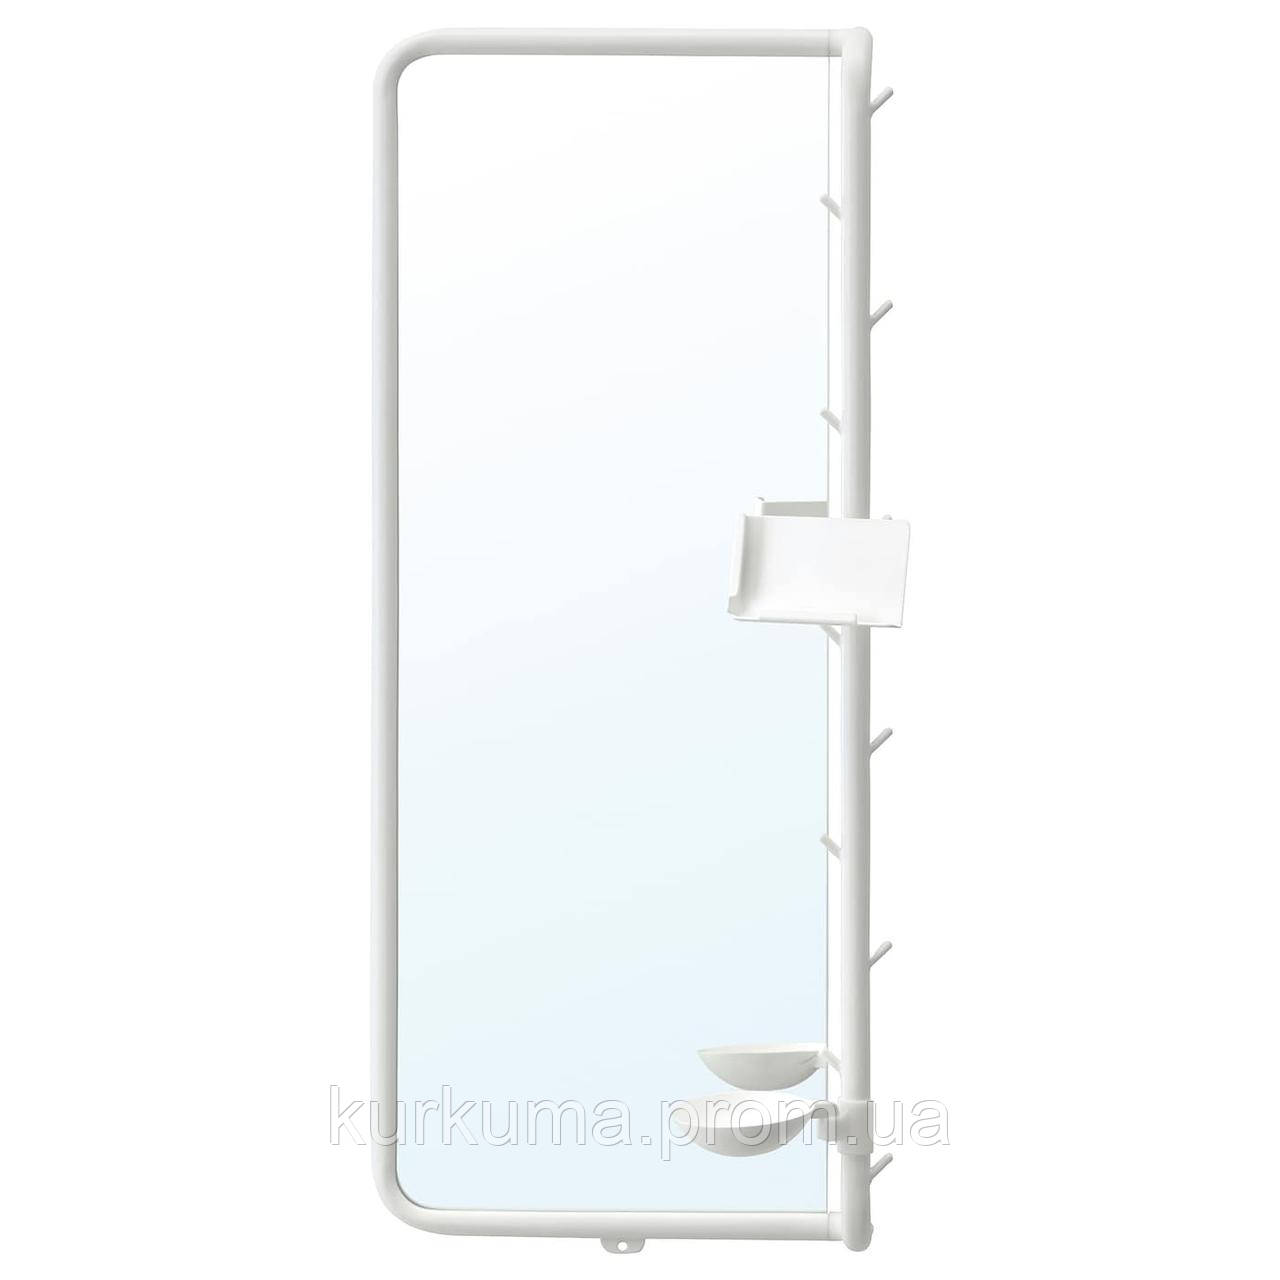 IKEA MOJLIGHET Зеркало, белое, 34х81 см (704.213.75)